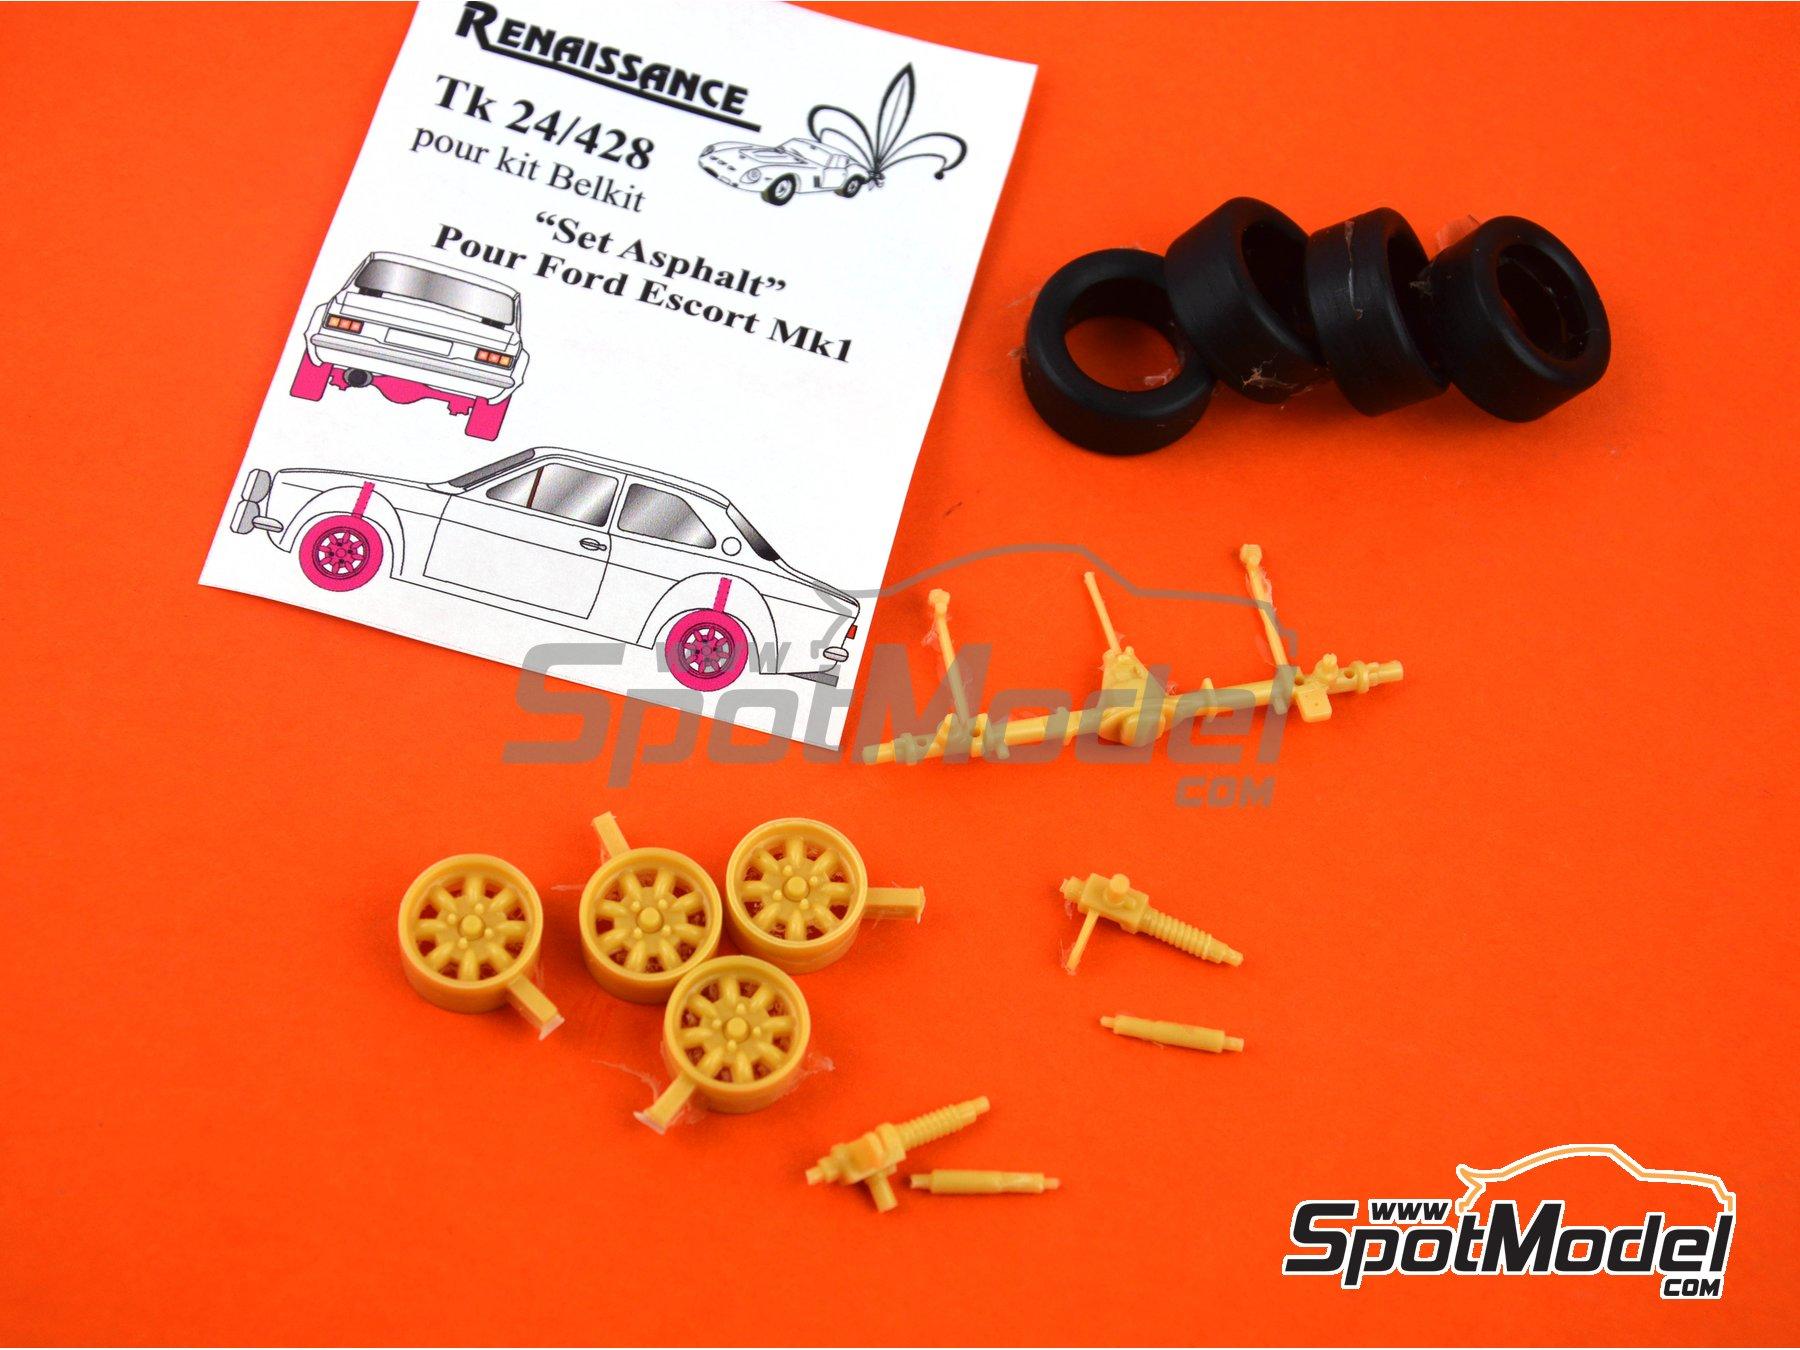 Image 2: Ford Escort RS1600 Mk I | Set de conversión a asfalto en escala1/24 fabricado por Renaissance Models (ref.TK24-428)